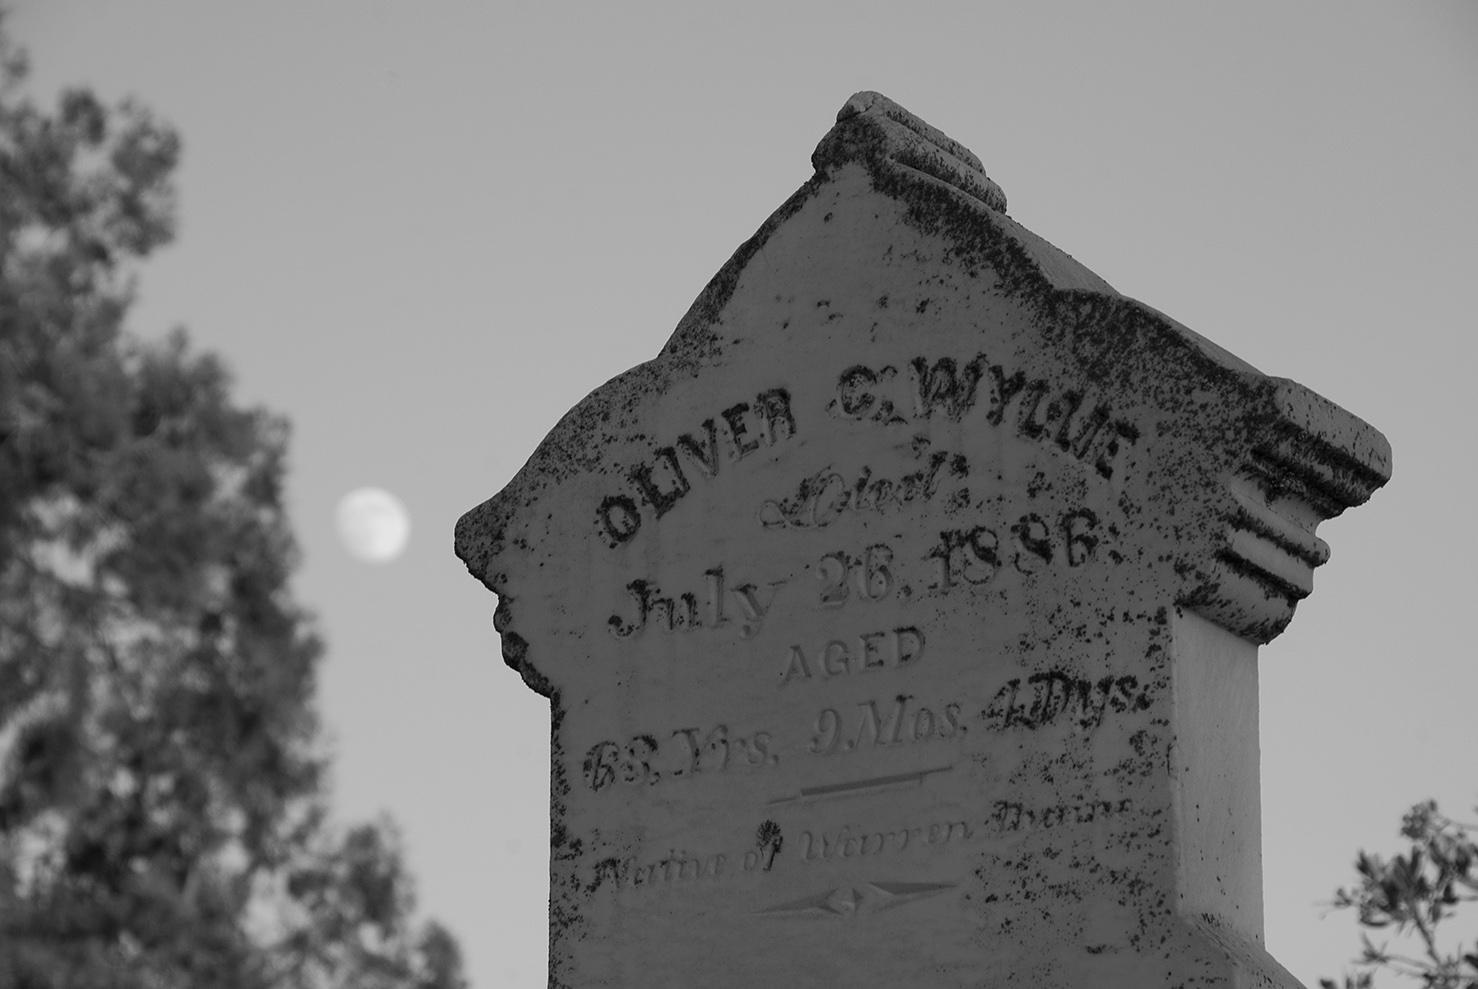 San Andreas Cemetery Oliver.jpg